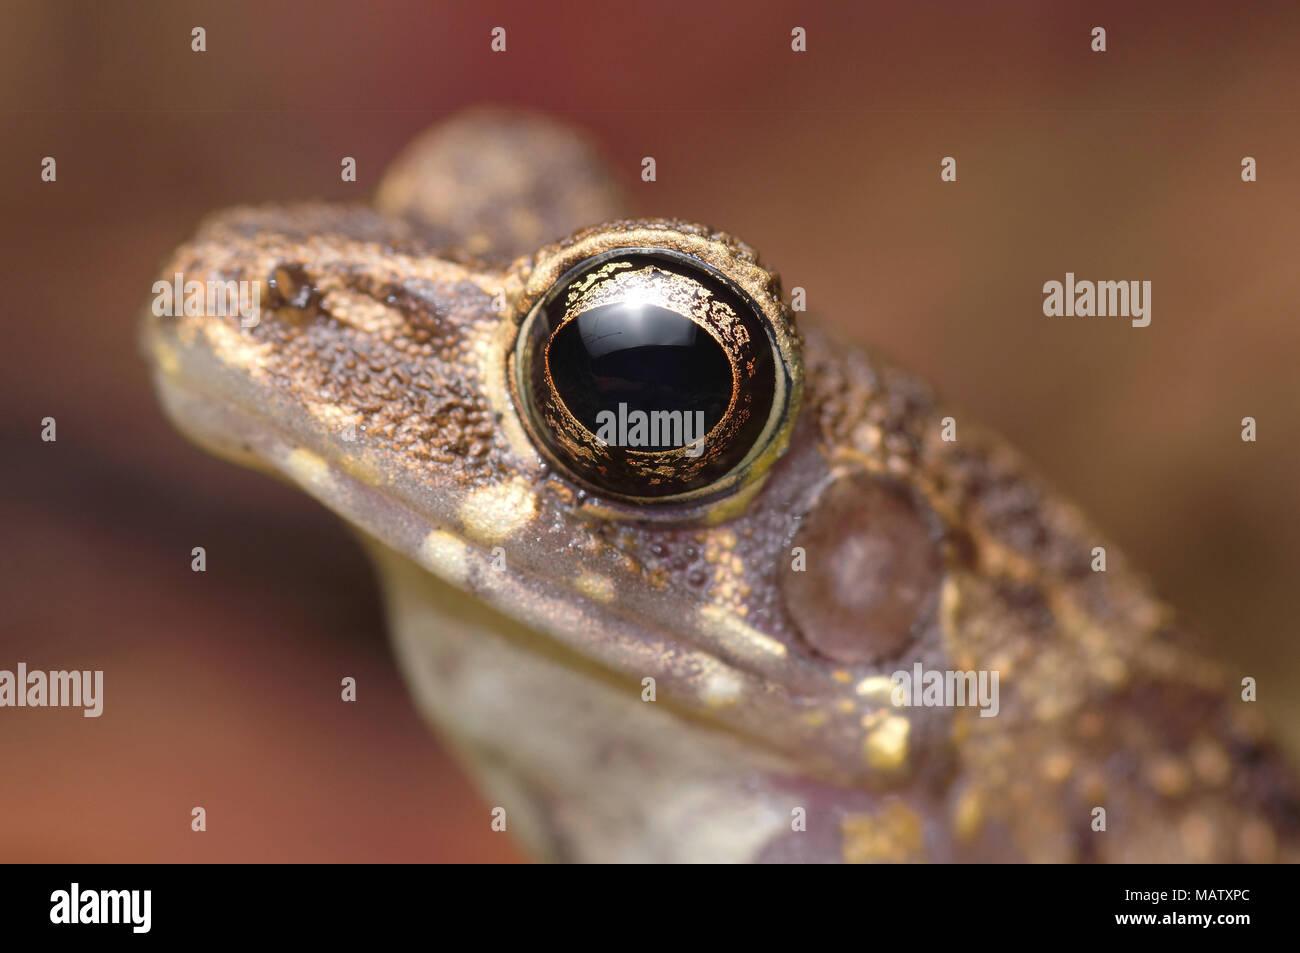 Brown marsh frog Hylarana baramica - Stock Image